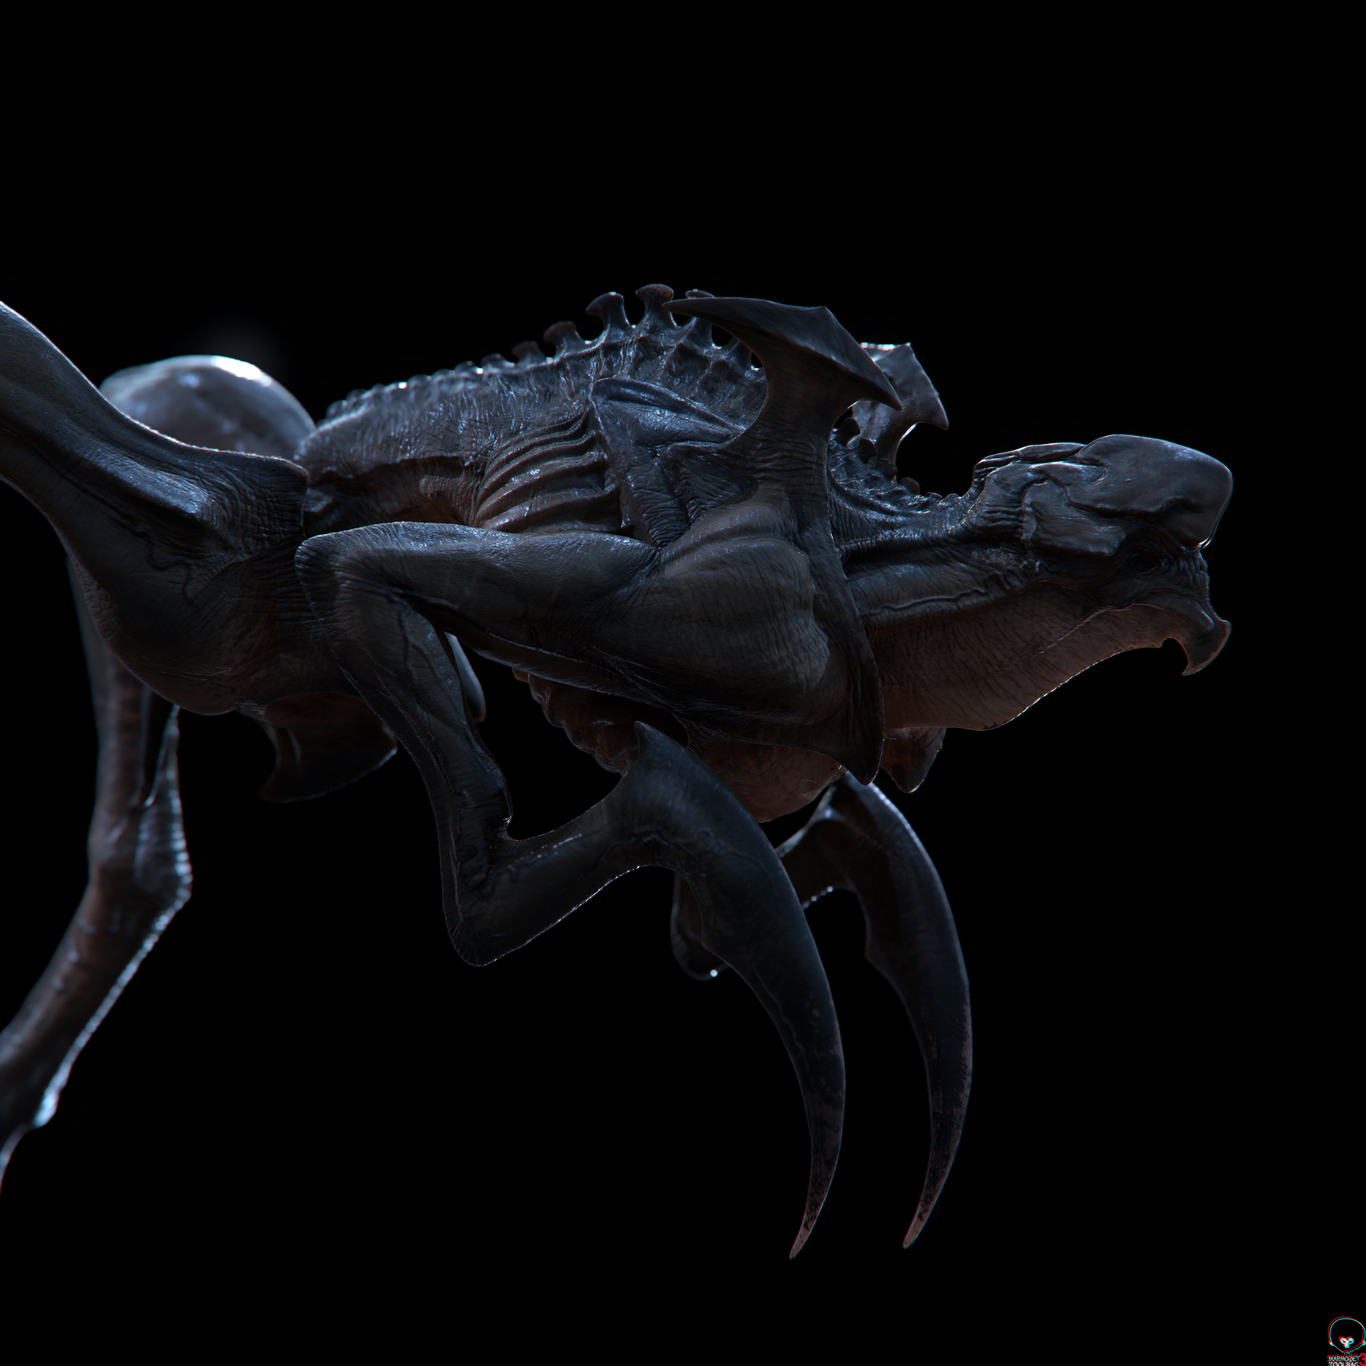 Cgsoufiane creature concept 1 5a846270 e7on